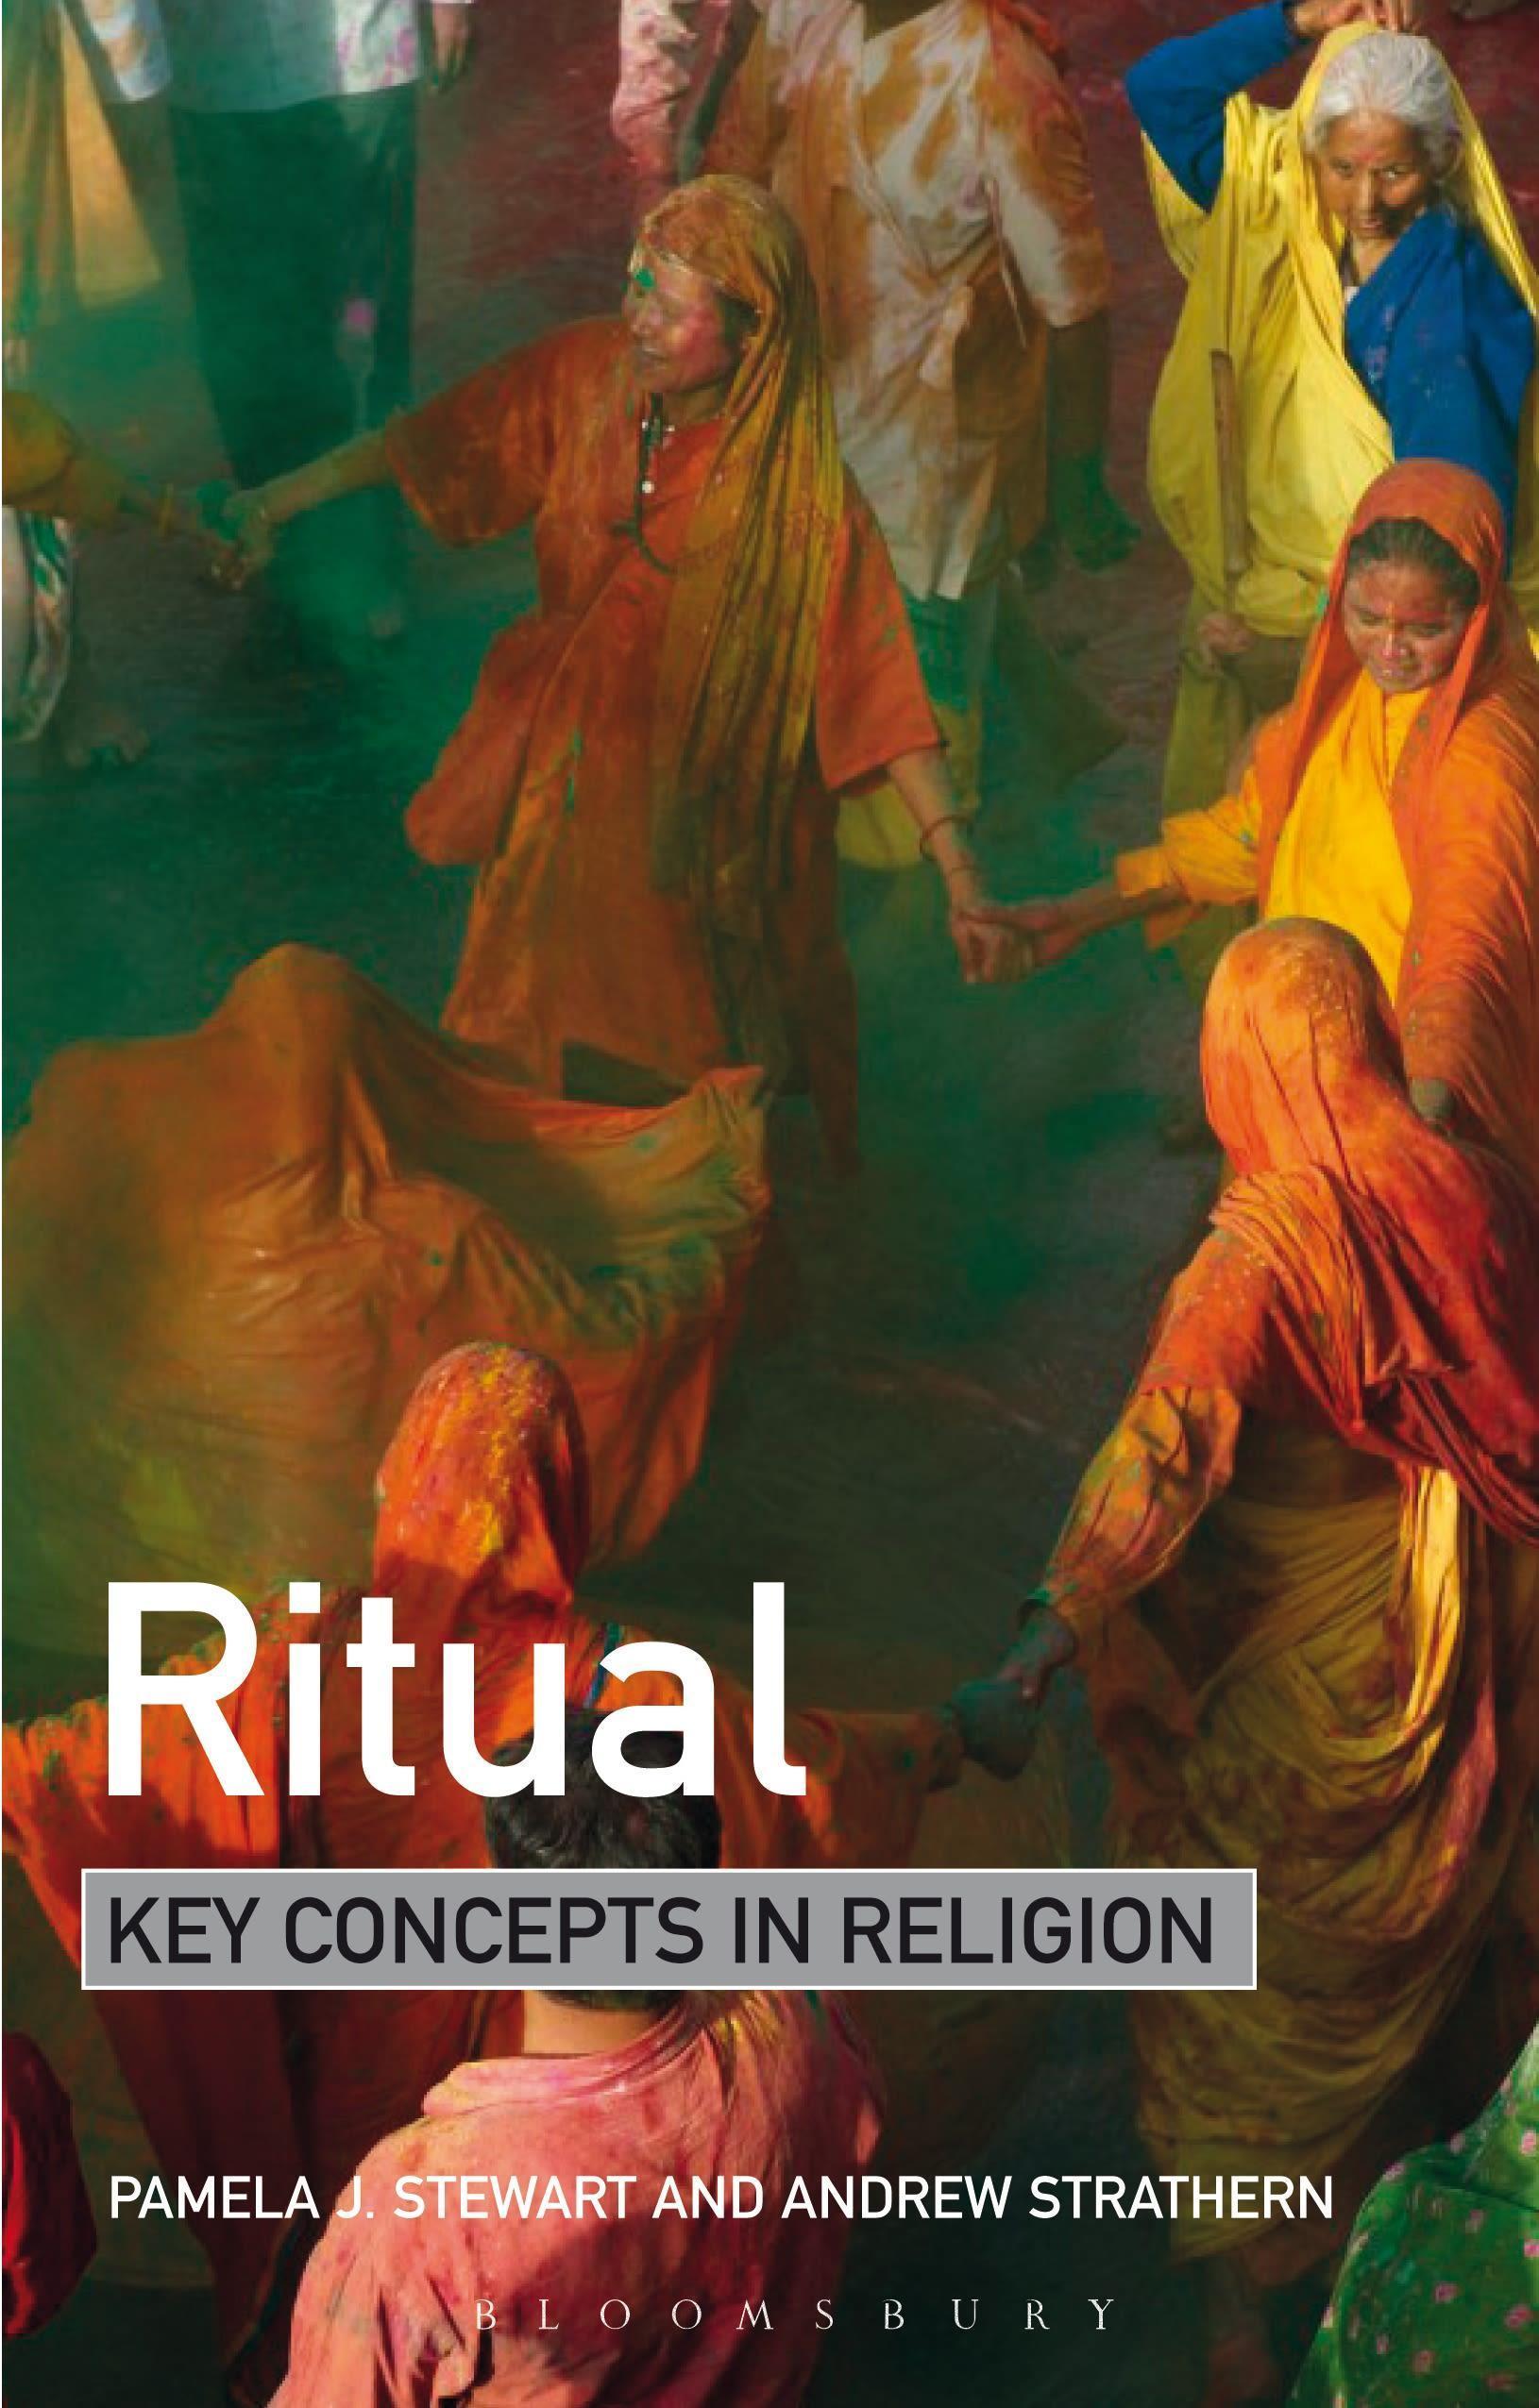 Ritual: Key Concepts in Religion Pamela J. Stewart